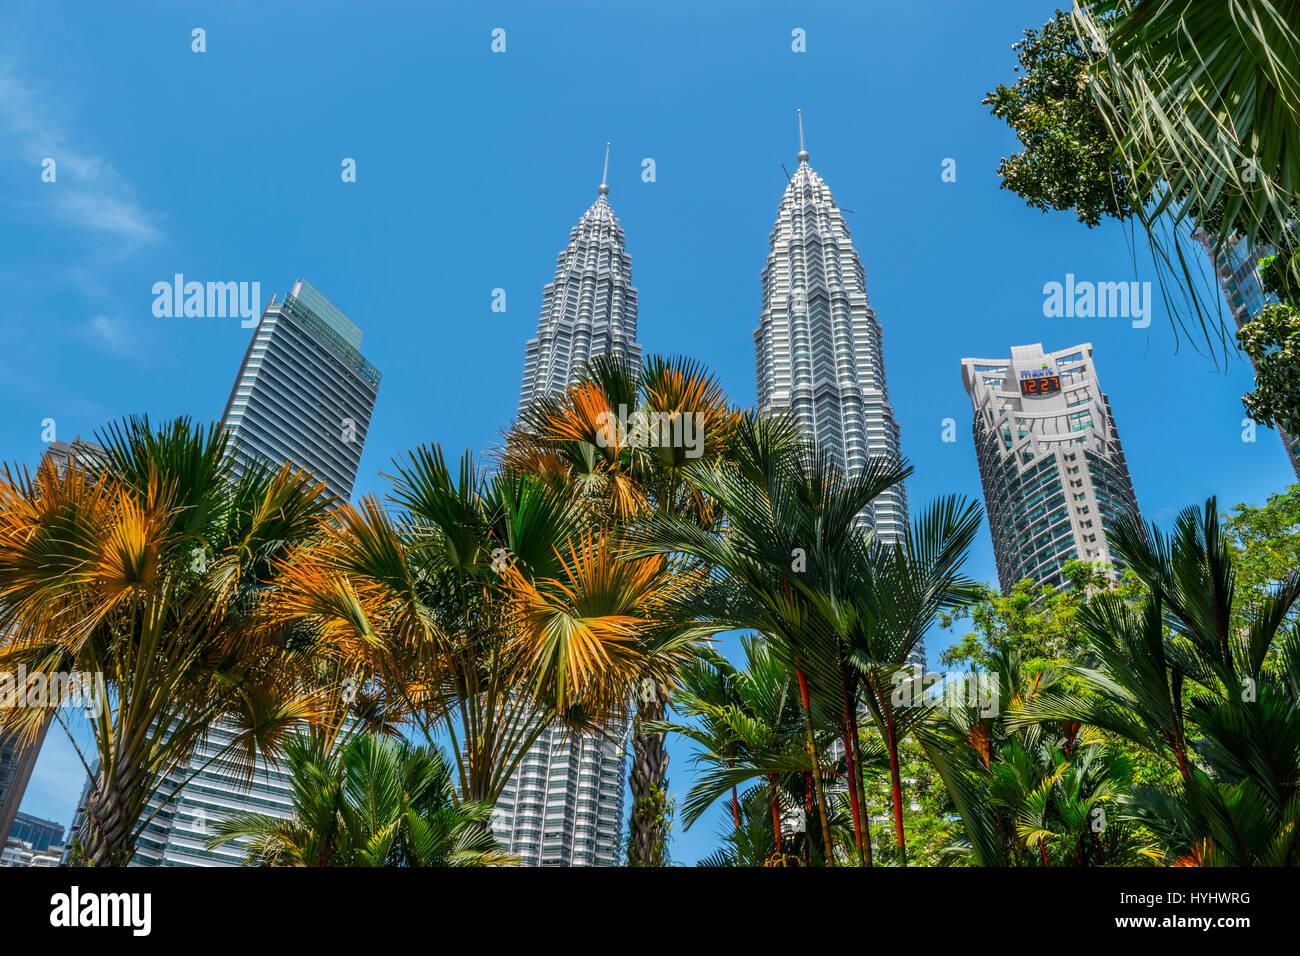 Petronas Twin Towers and Skyline from Kuala Lumpur City Centre Park, Malaysia - Stock Image